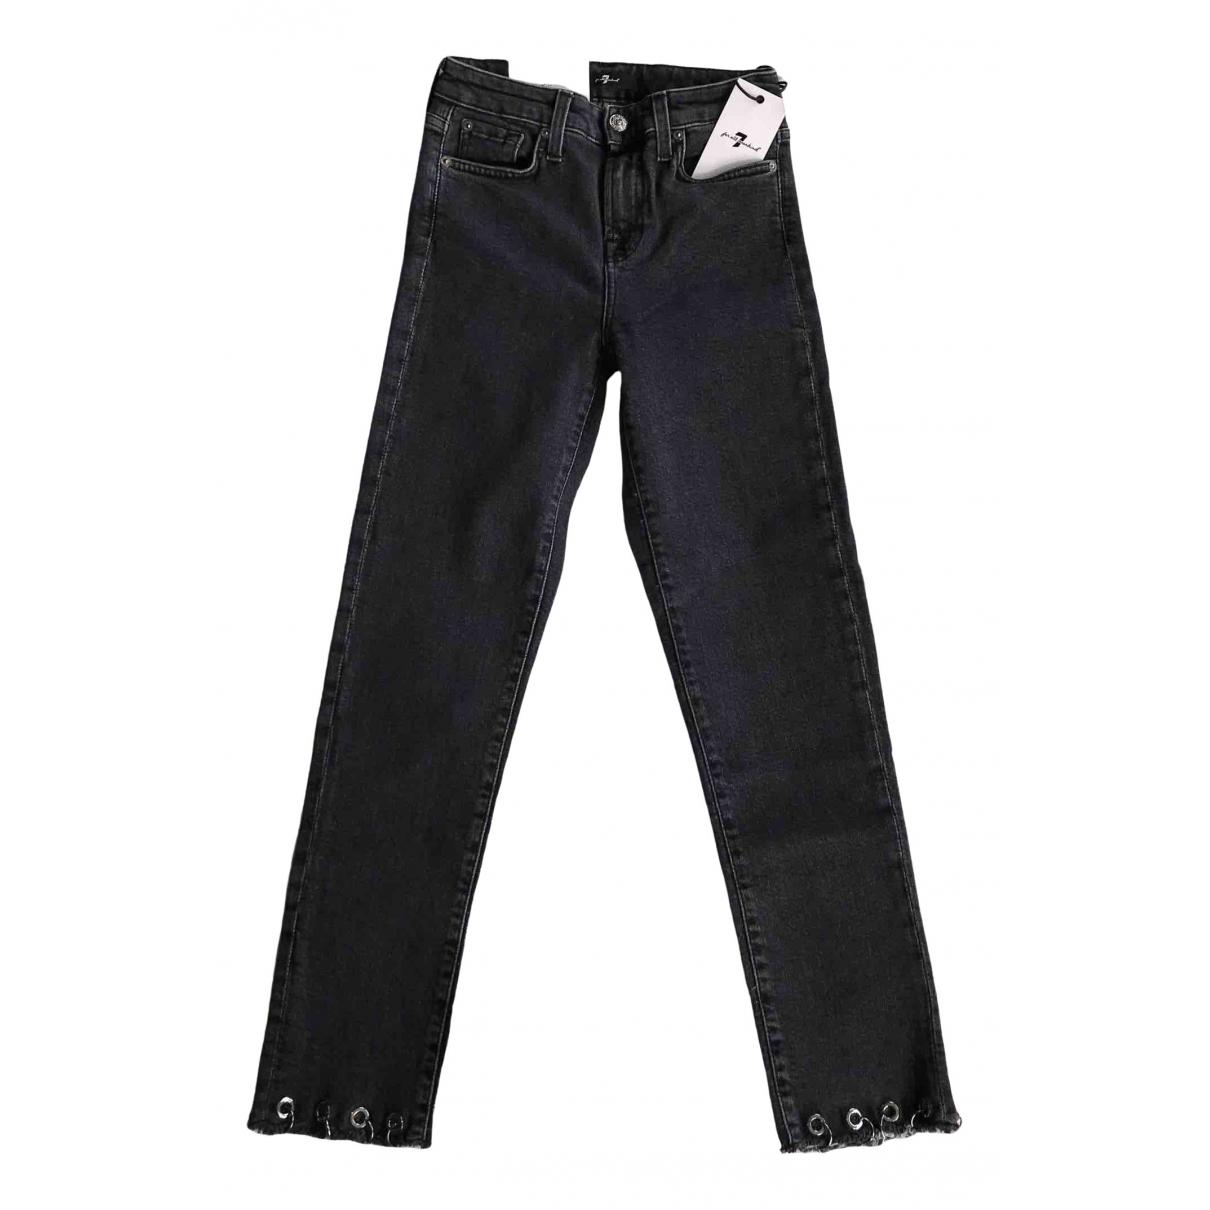 7 For All Mankind \N Black Denim - Jeans Jeans for Women 32 FR